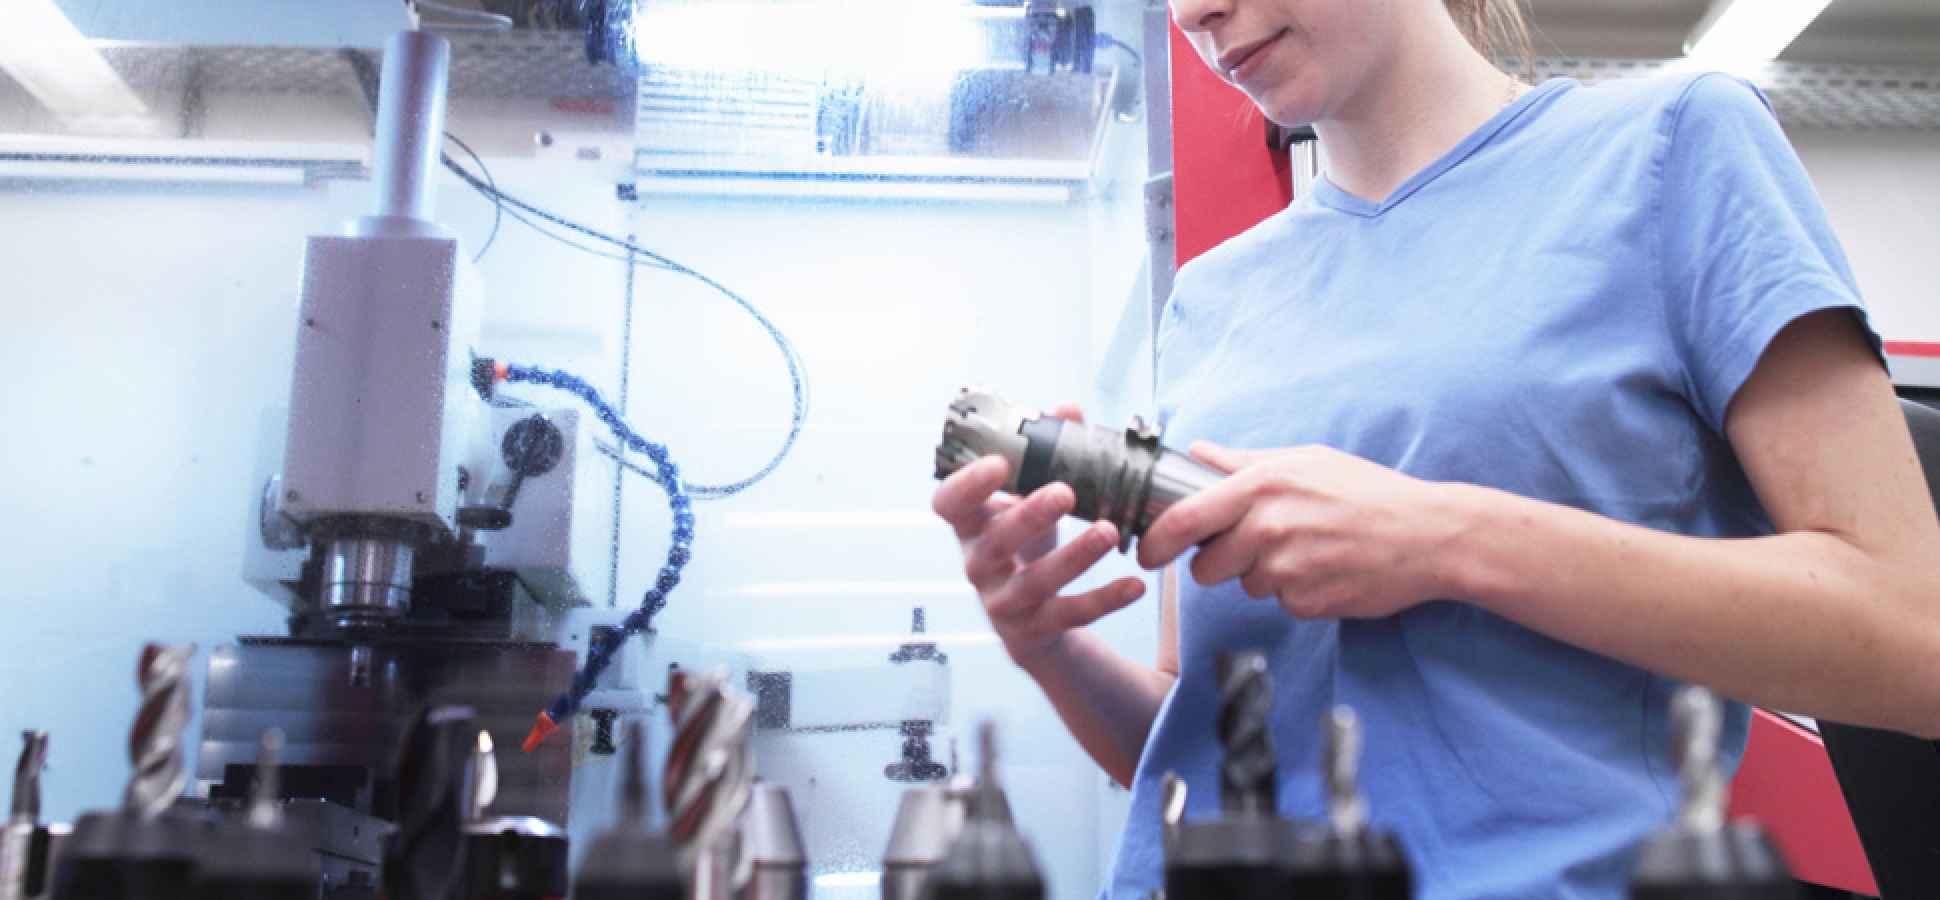 Blue apron engineering - Blue Apron Engineering 67